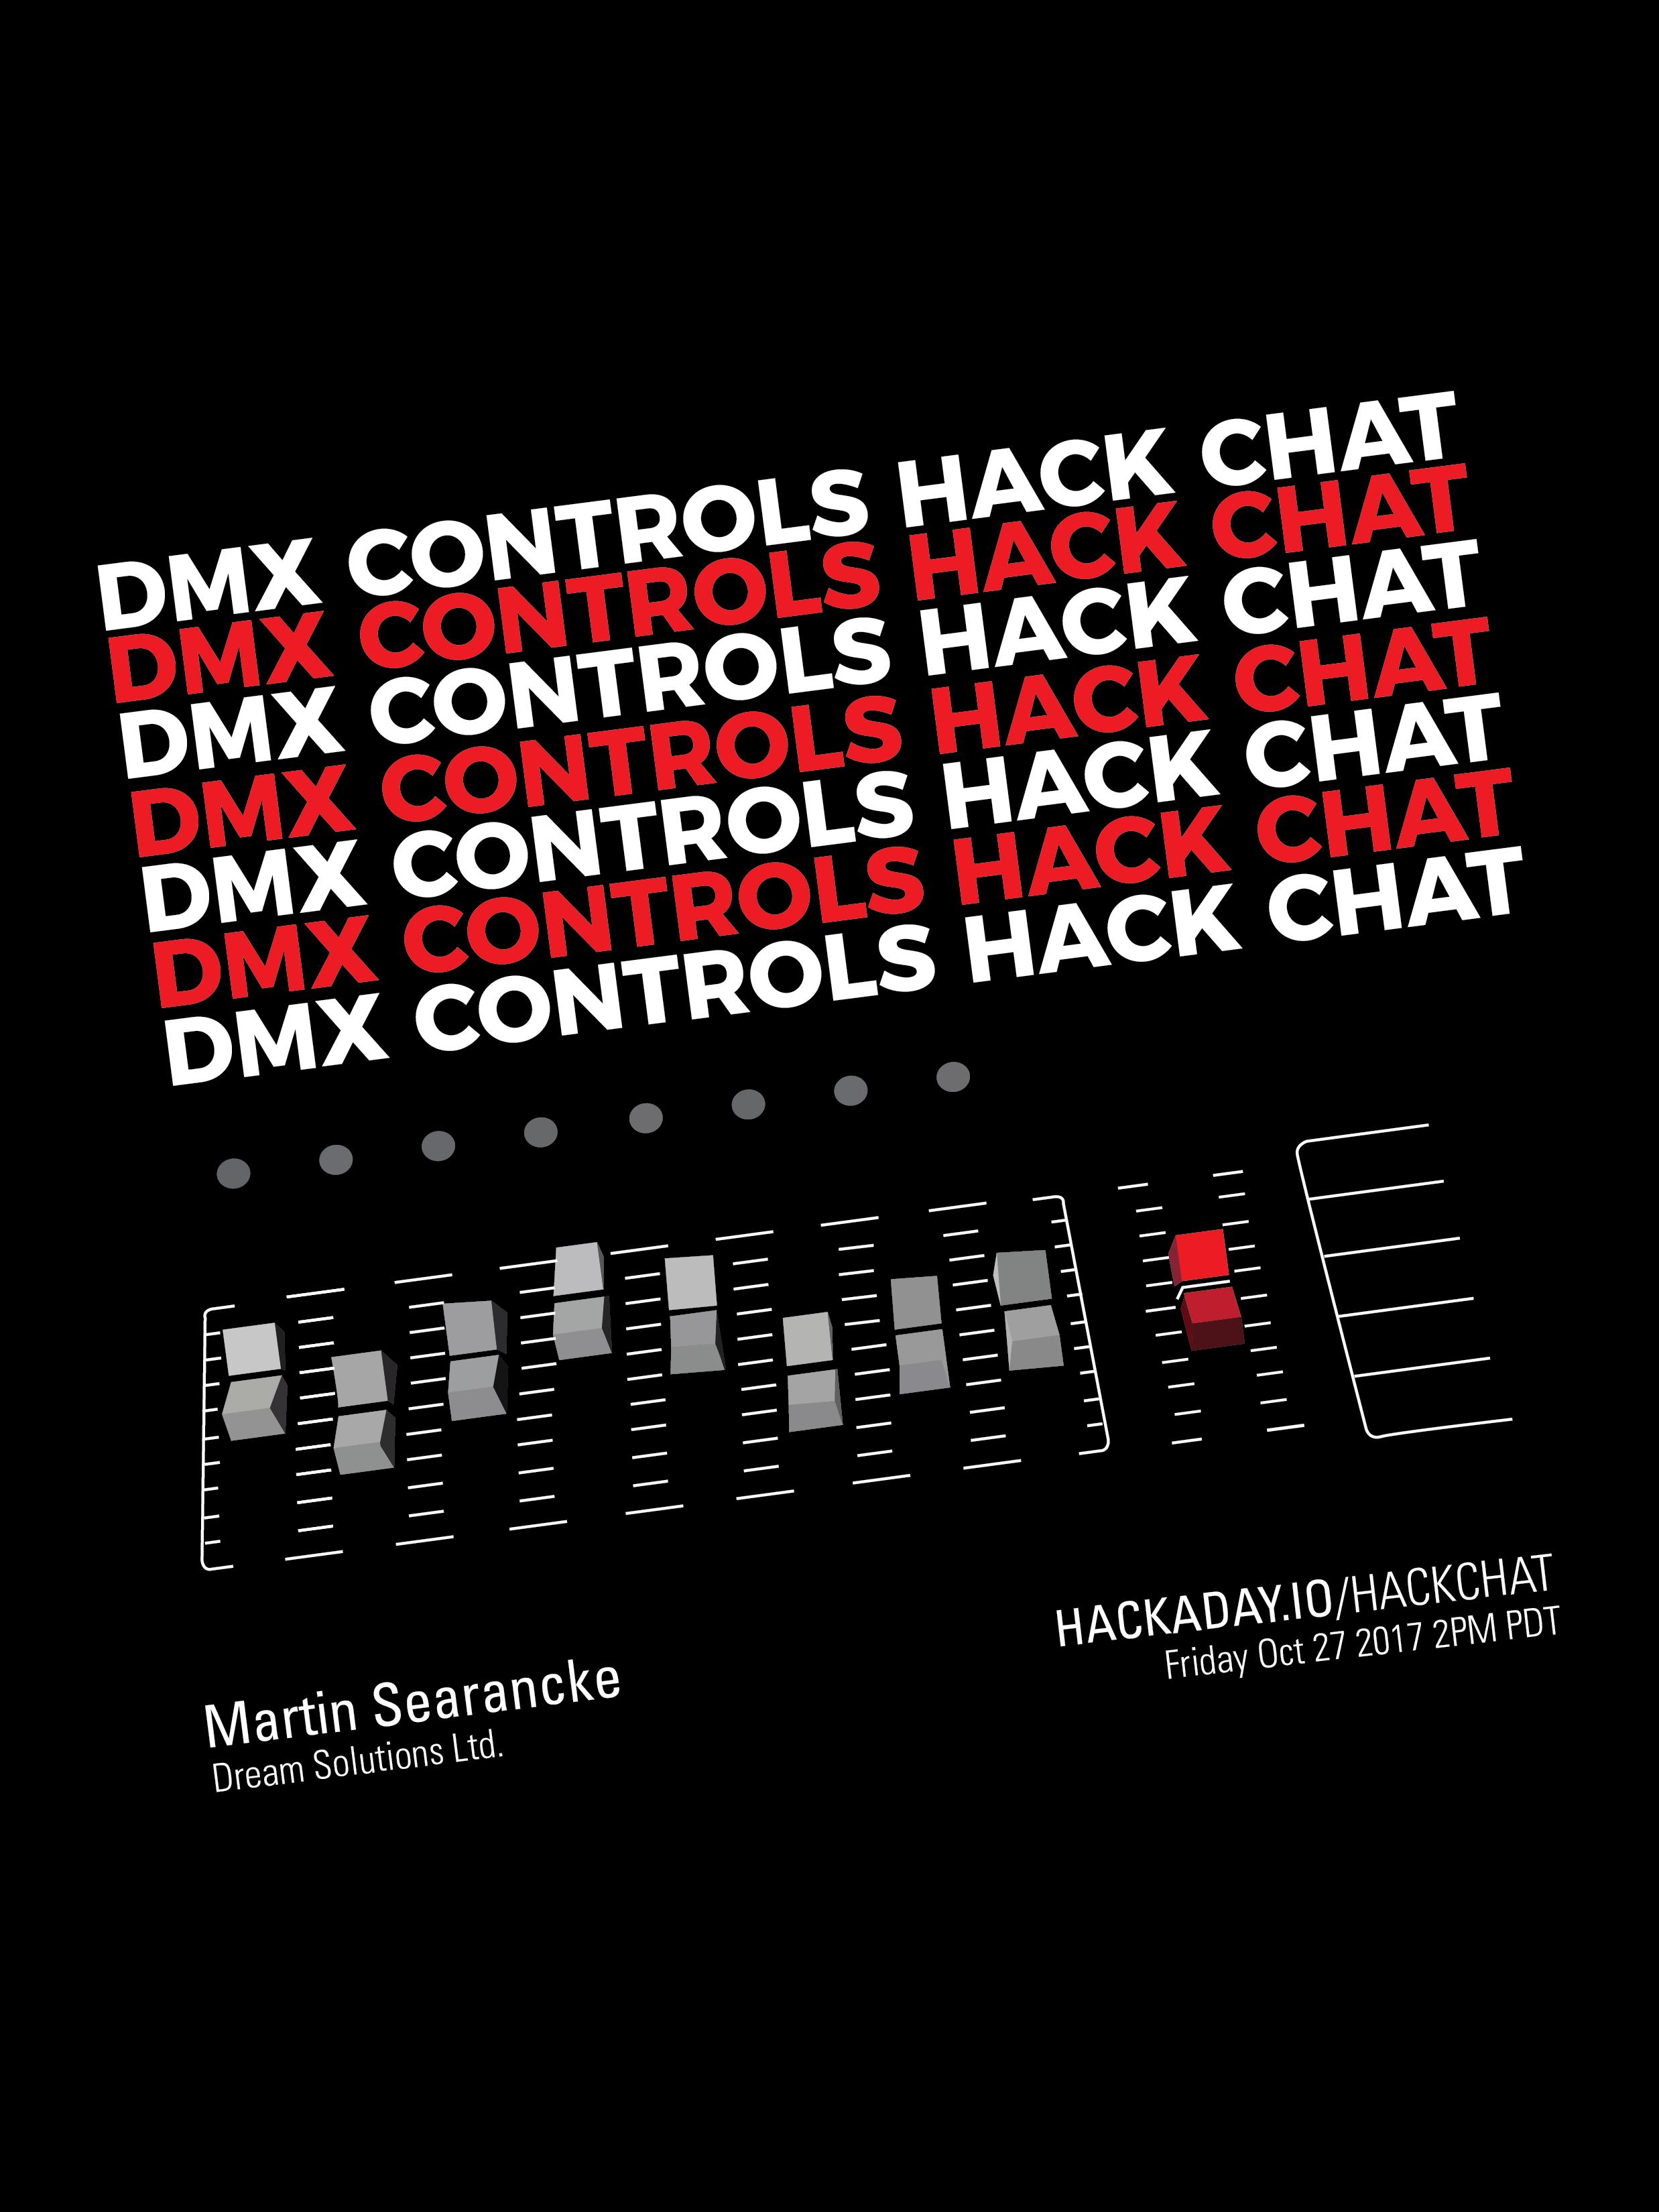 Dmx | Hackaday